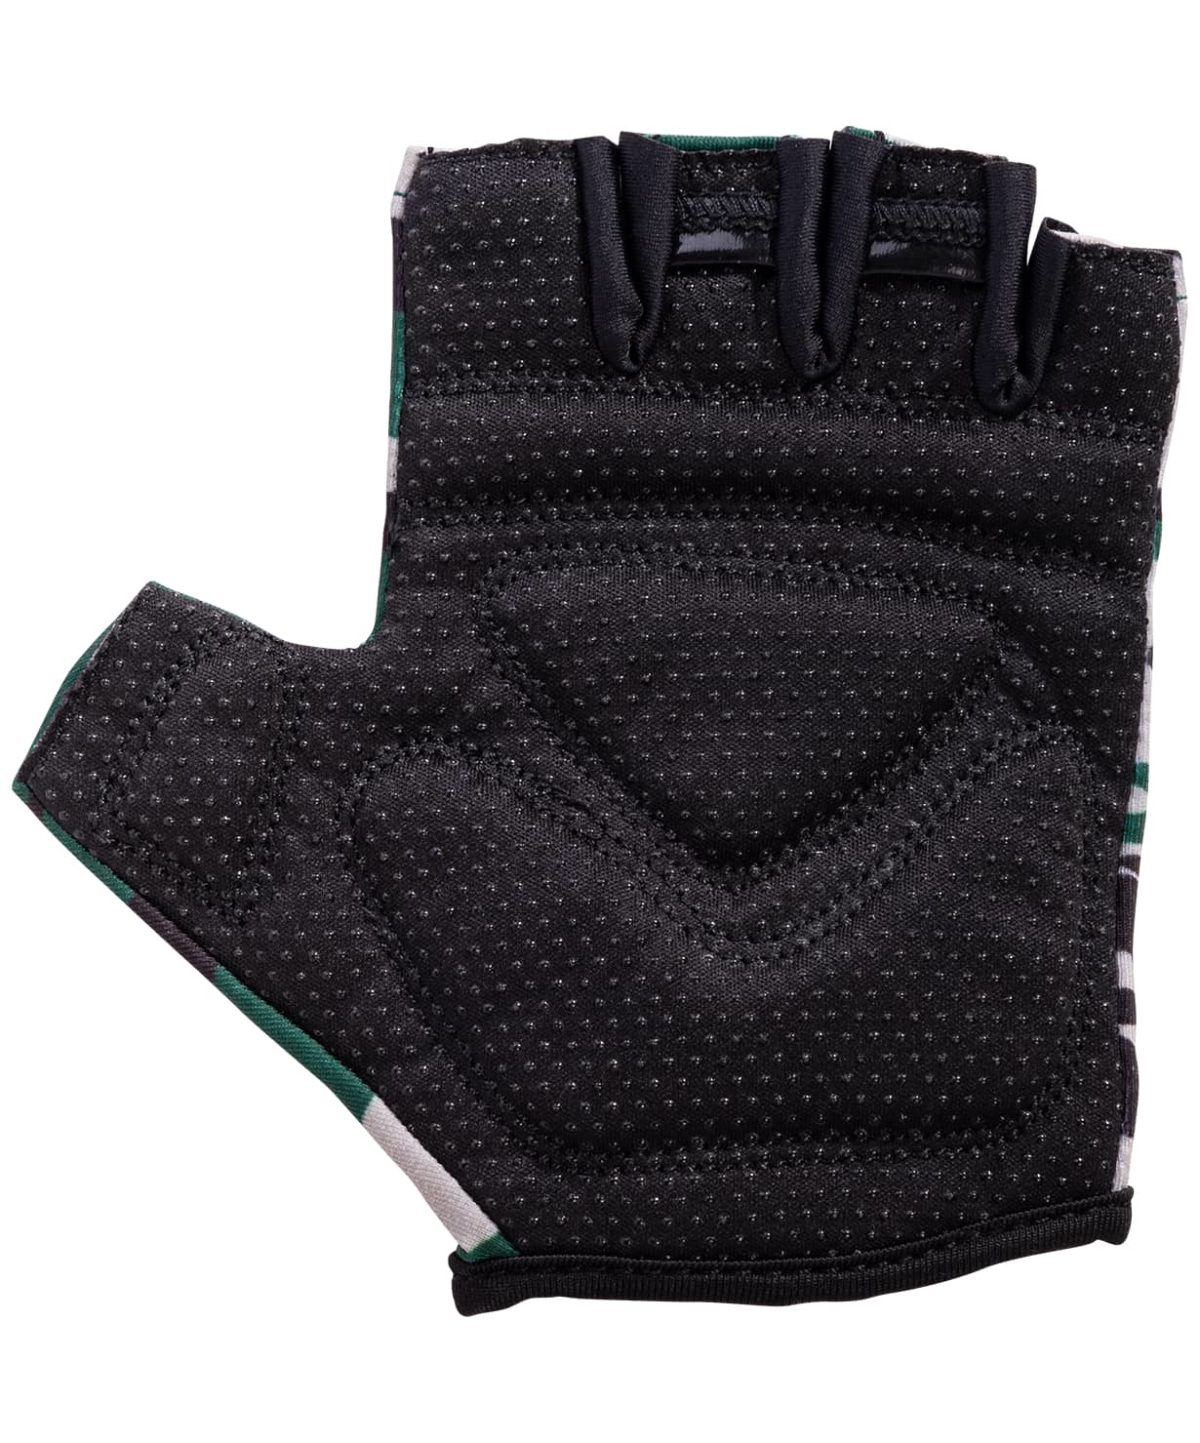 STARFIT перчатки д/фитнеса  SU-126: хаки - 3